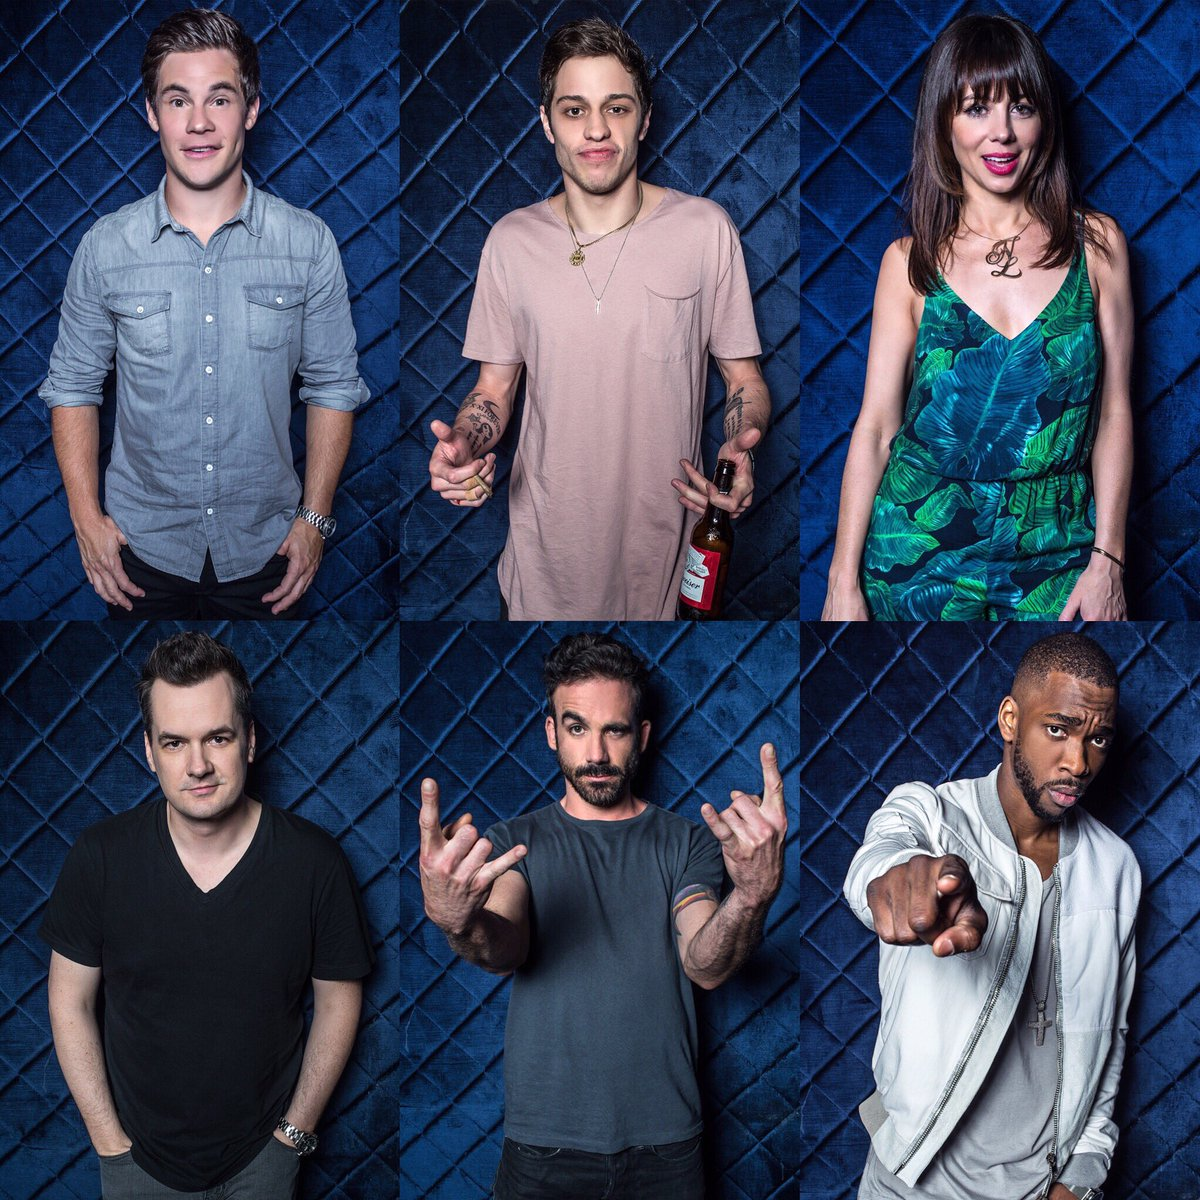 2nite WATCH @TheGDComedyJam #gdcj aka the Goddamn Comedy Jam on @ComedyCentral at 1130pm after the #VMAs2016 https://t.co/05nm2KmyrZ